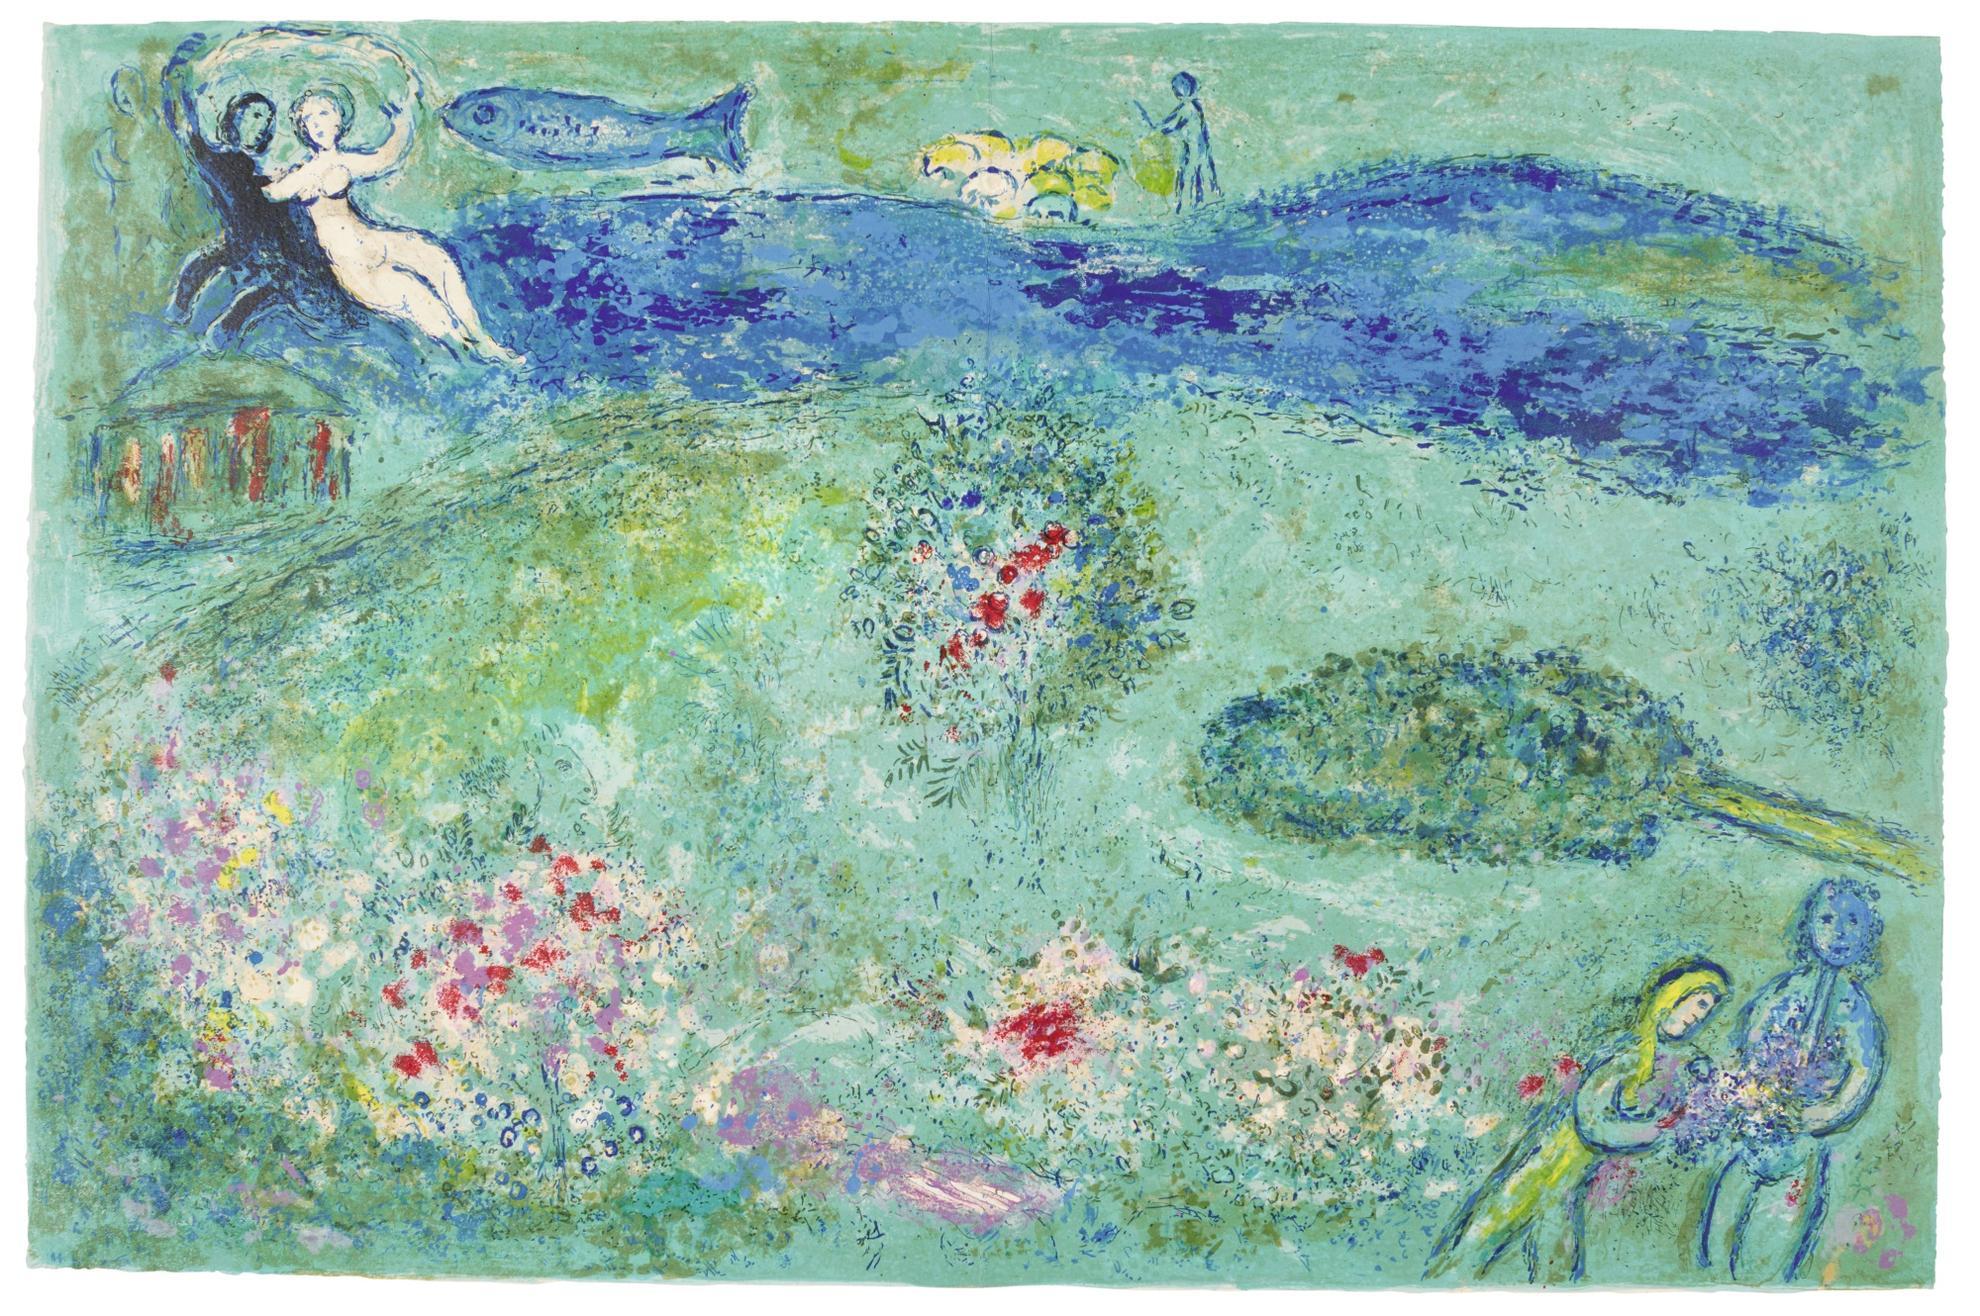 Marc Chagall-Le Verger (Mourlot 341; Cramer Books 46)-1961